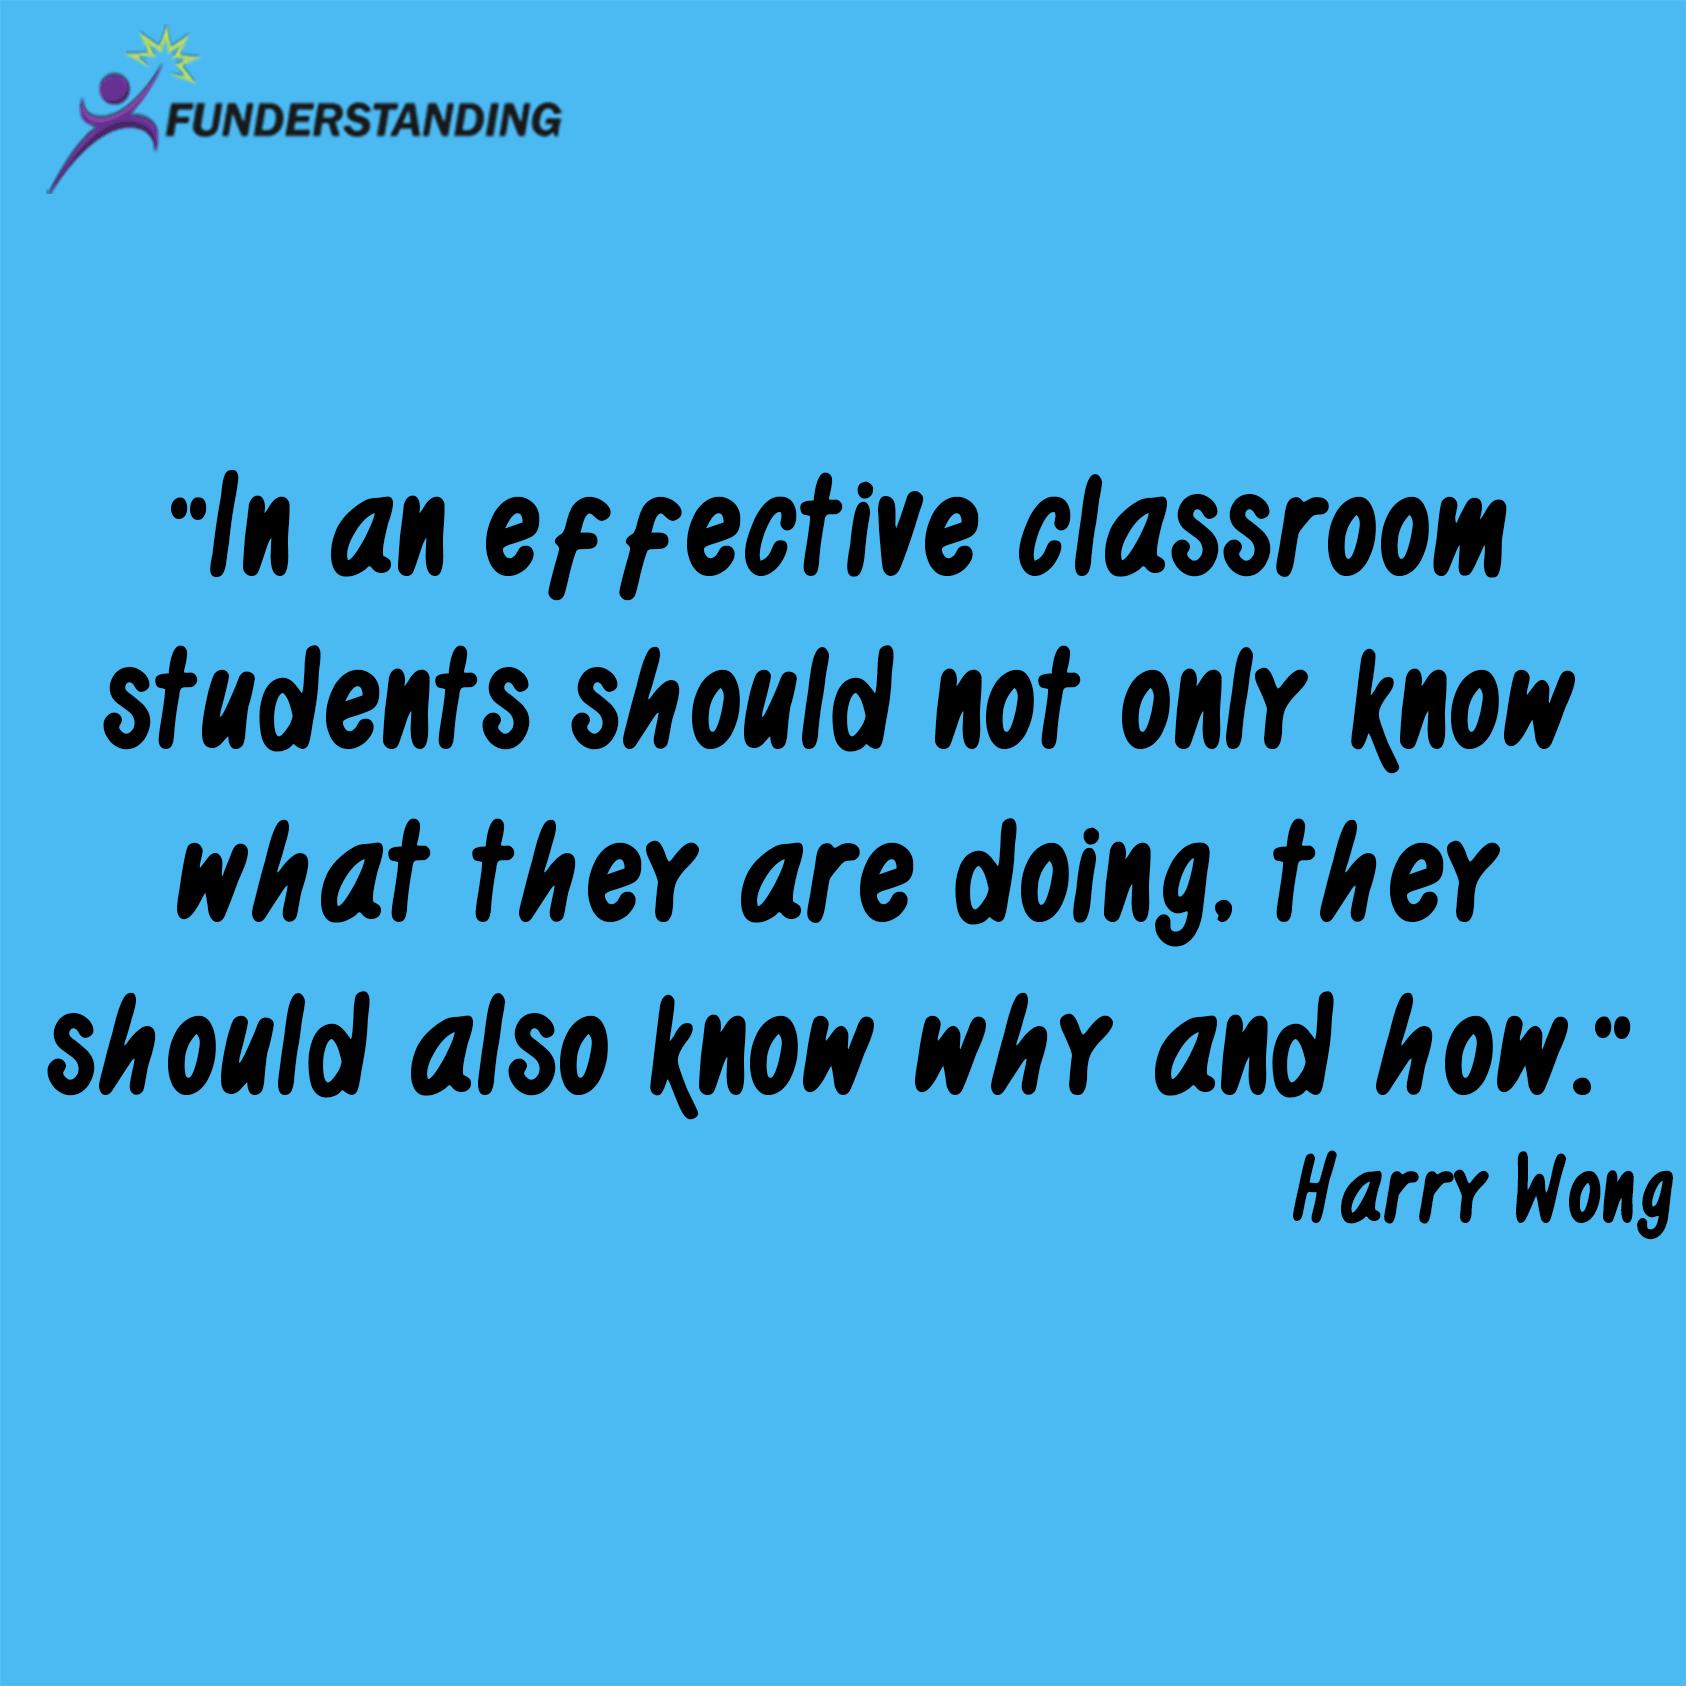 Classroom Design Quotes ~ Educational quotes funderstanding education curriculum